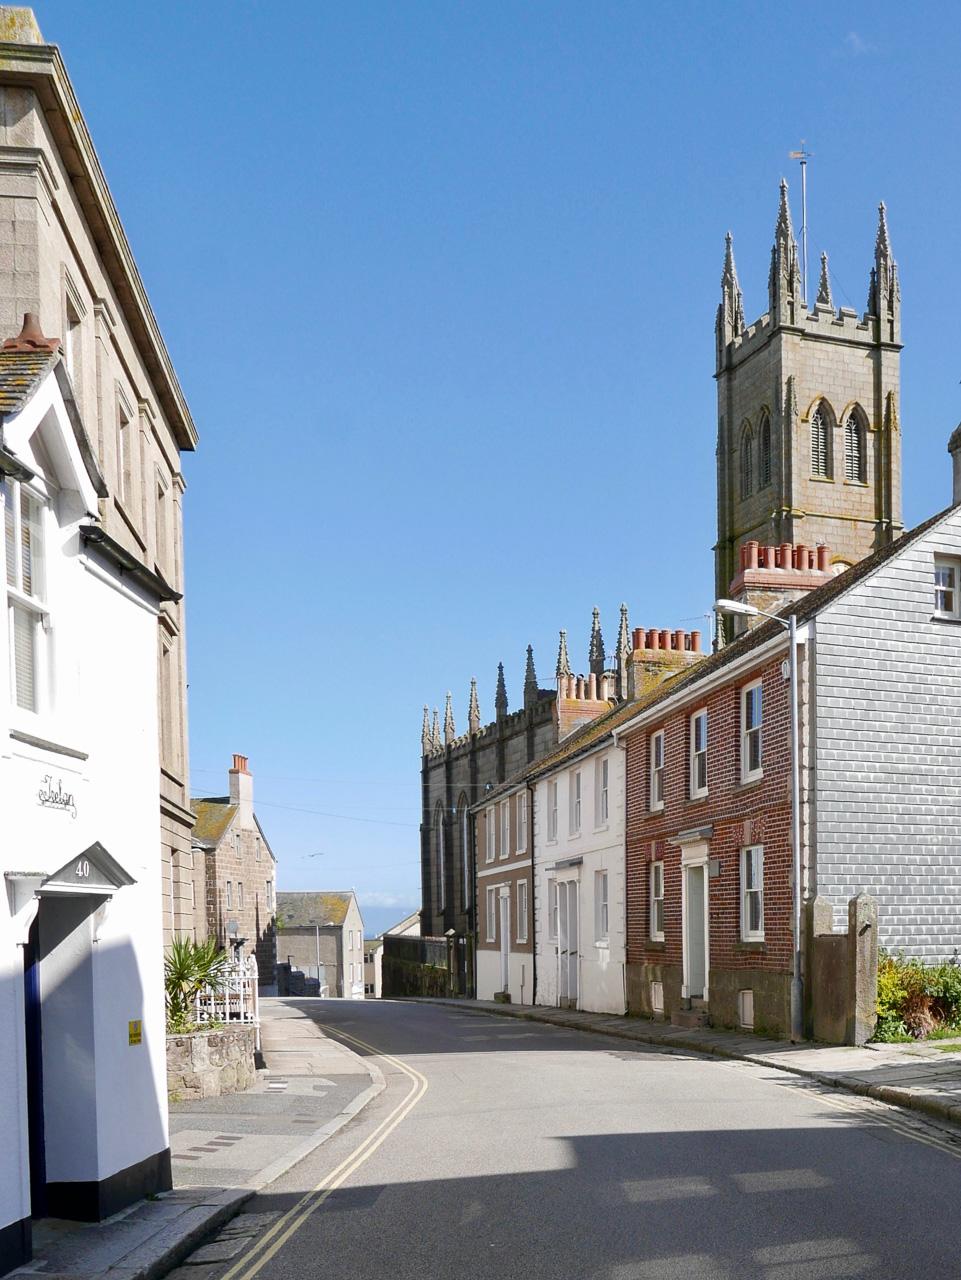 Cara Sharratt Travel - Penzance, Cornwall